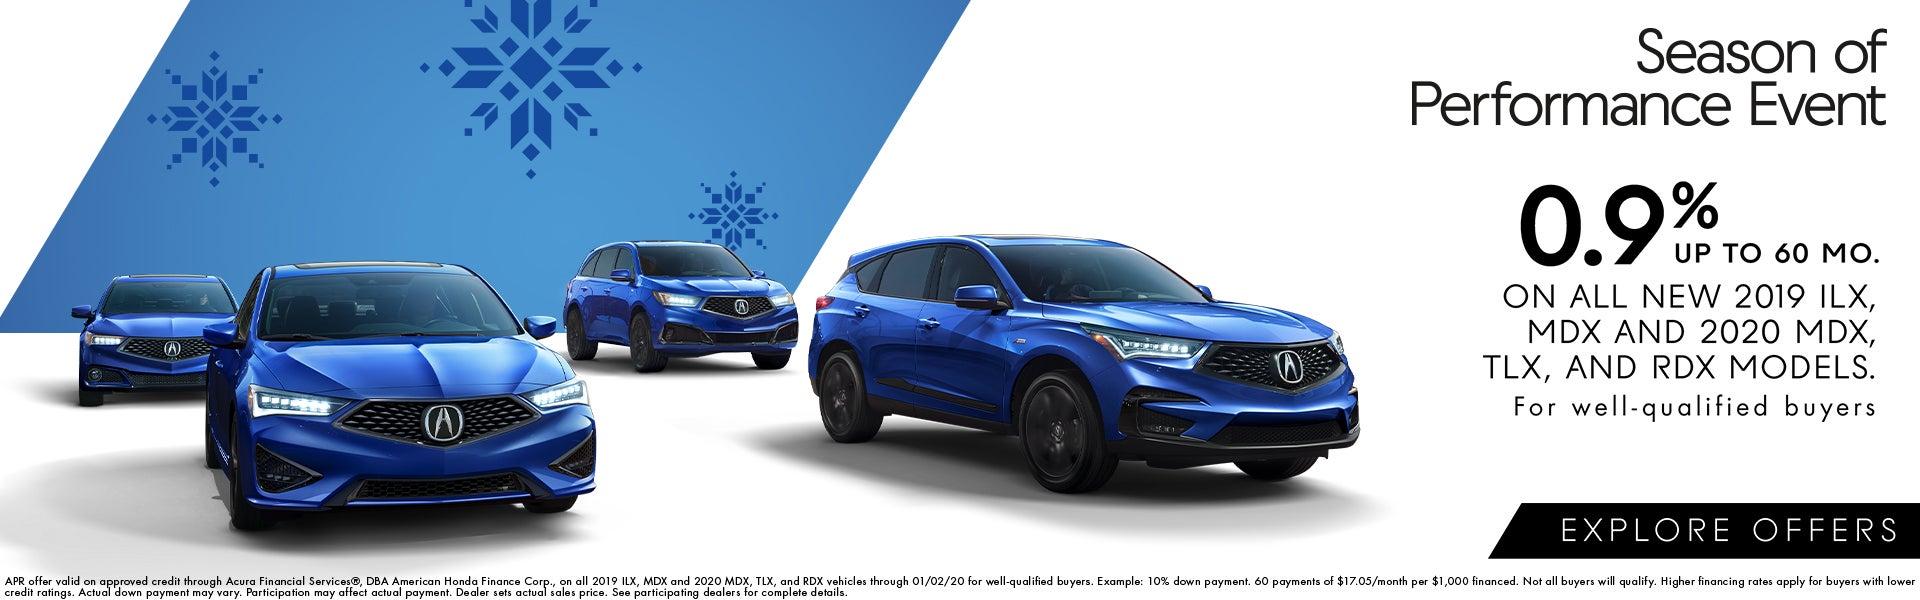 Used Cars Burlington Vt >> Acura Dealer In South Burlington Vt Used Cars South